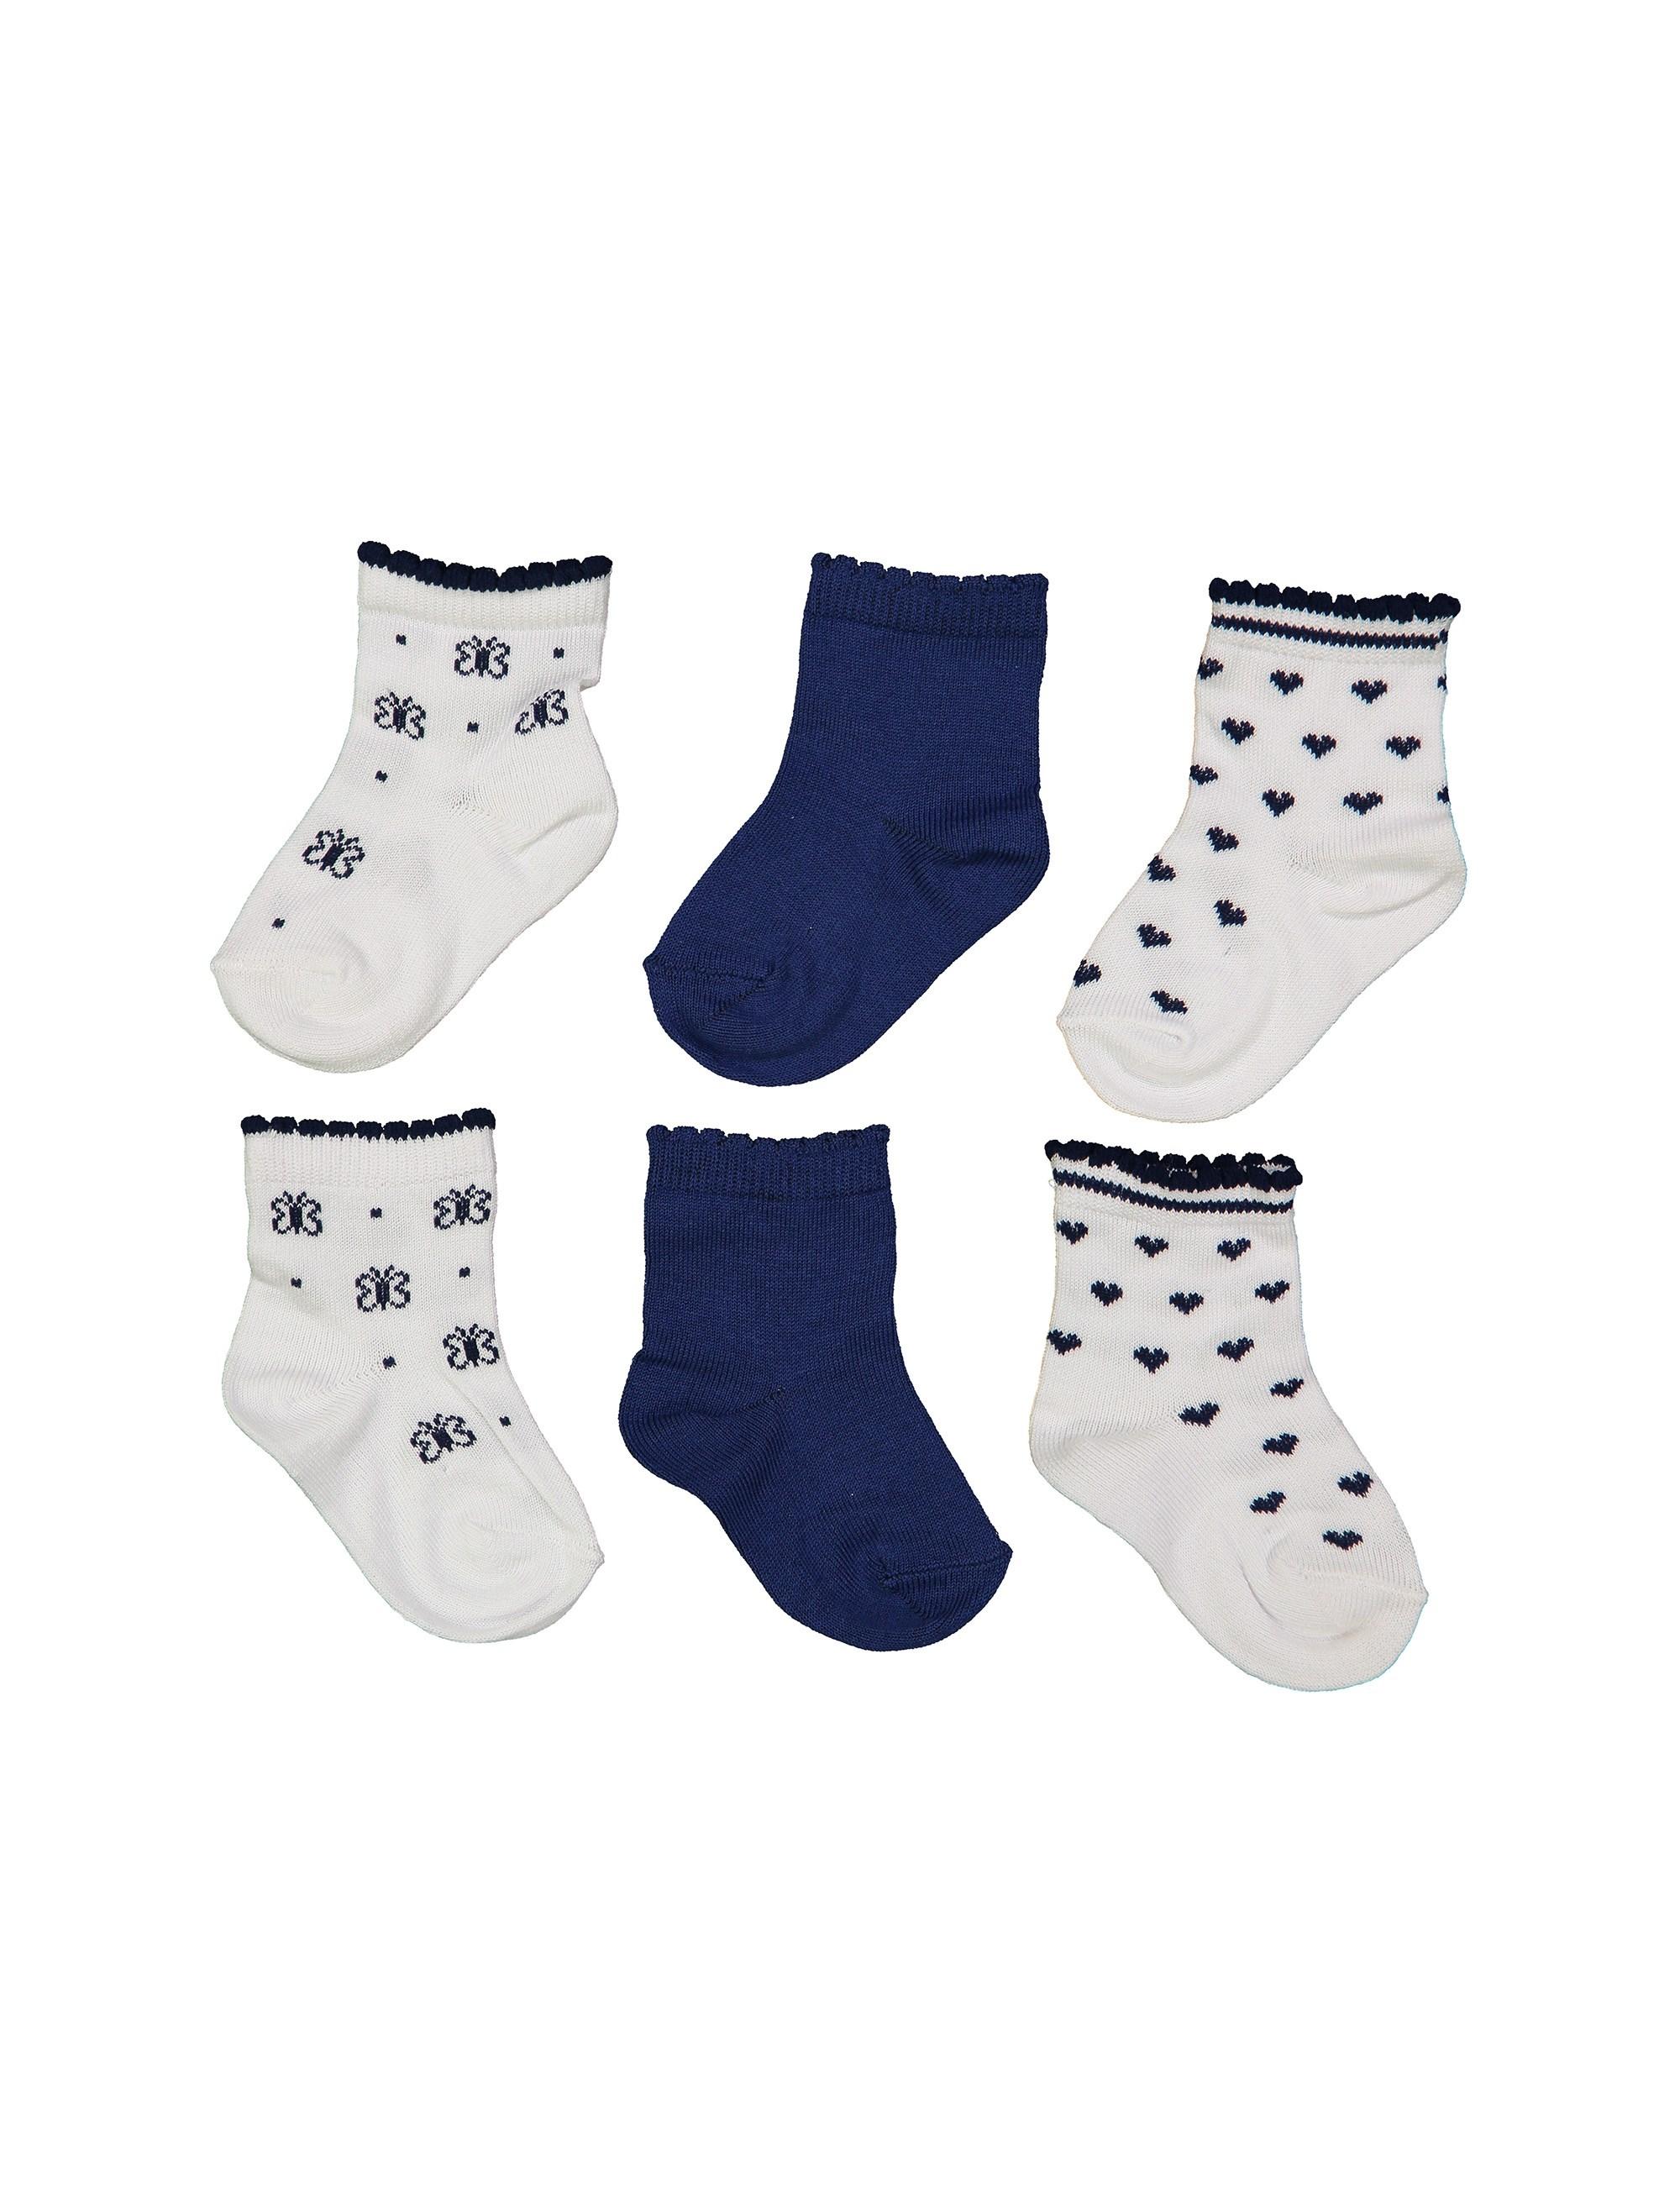 جوراب نخی دخترانه بسته 3 عددی - بلوکیدز